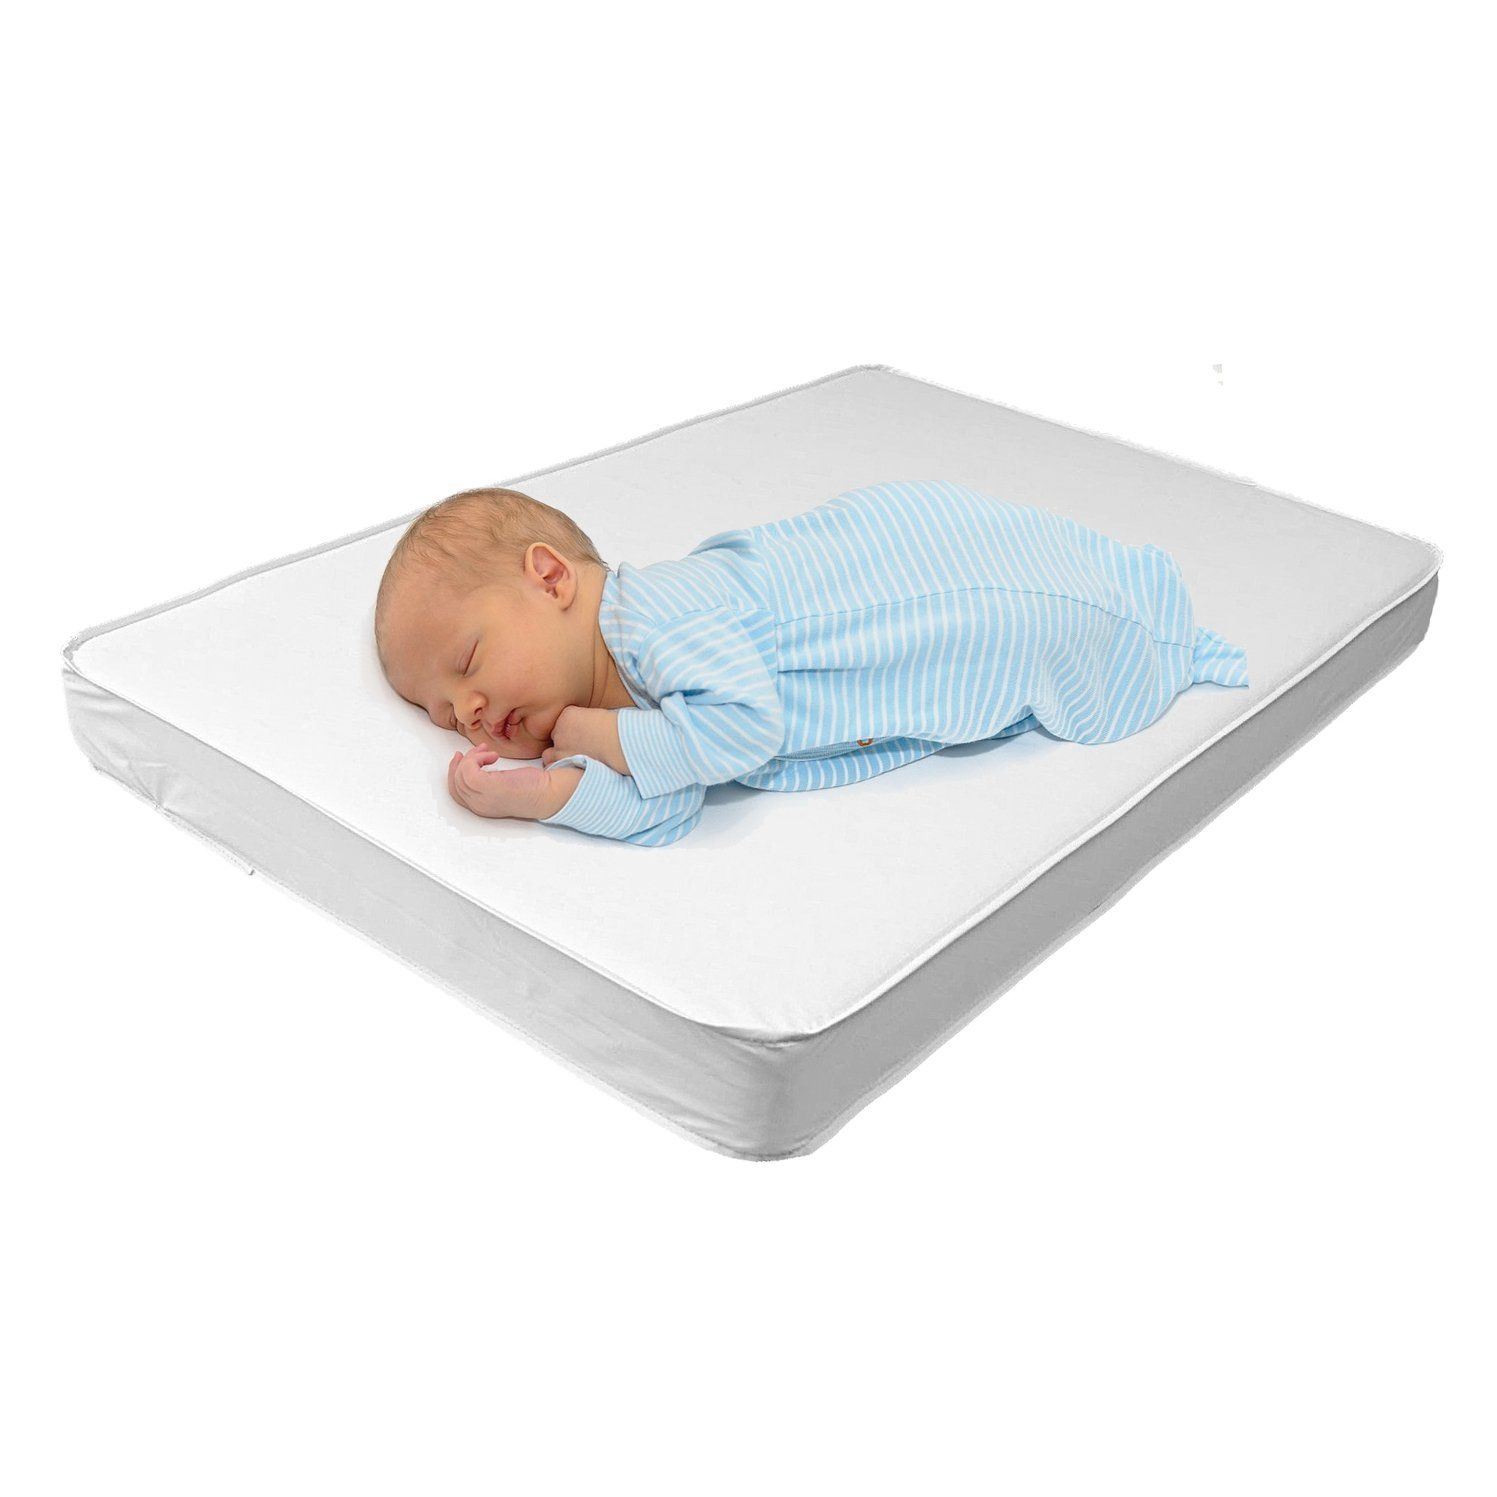 Sleep Zone Life,Bedding,Nanotechnology,navy blue,king,pillow top